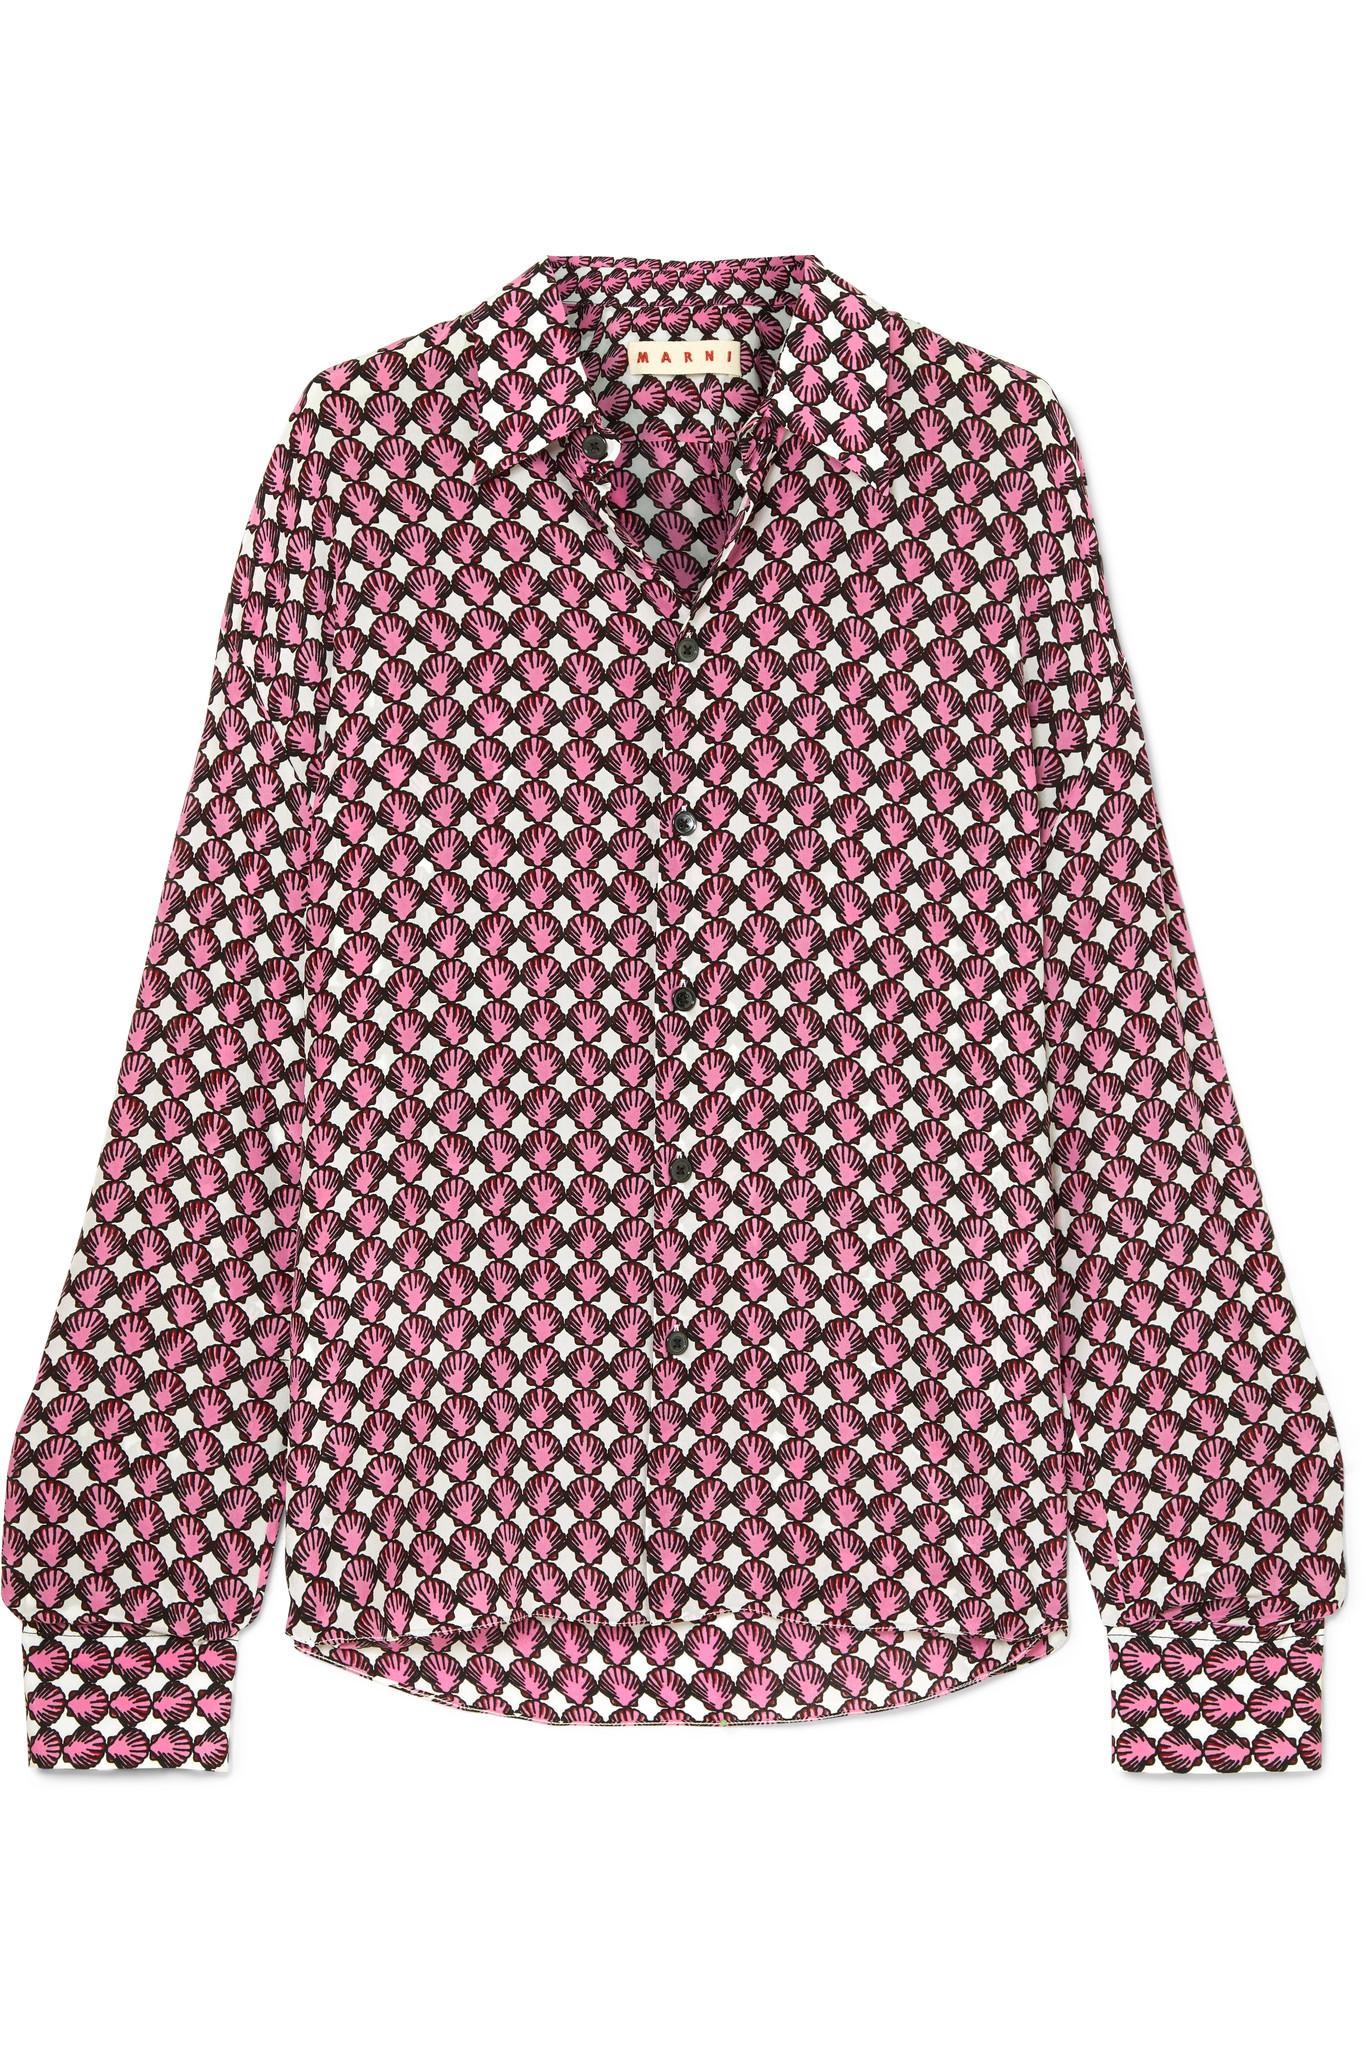 eee68e52ad8f7c Marni Printed Silk-crepe Shirt in Pink - Lyst